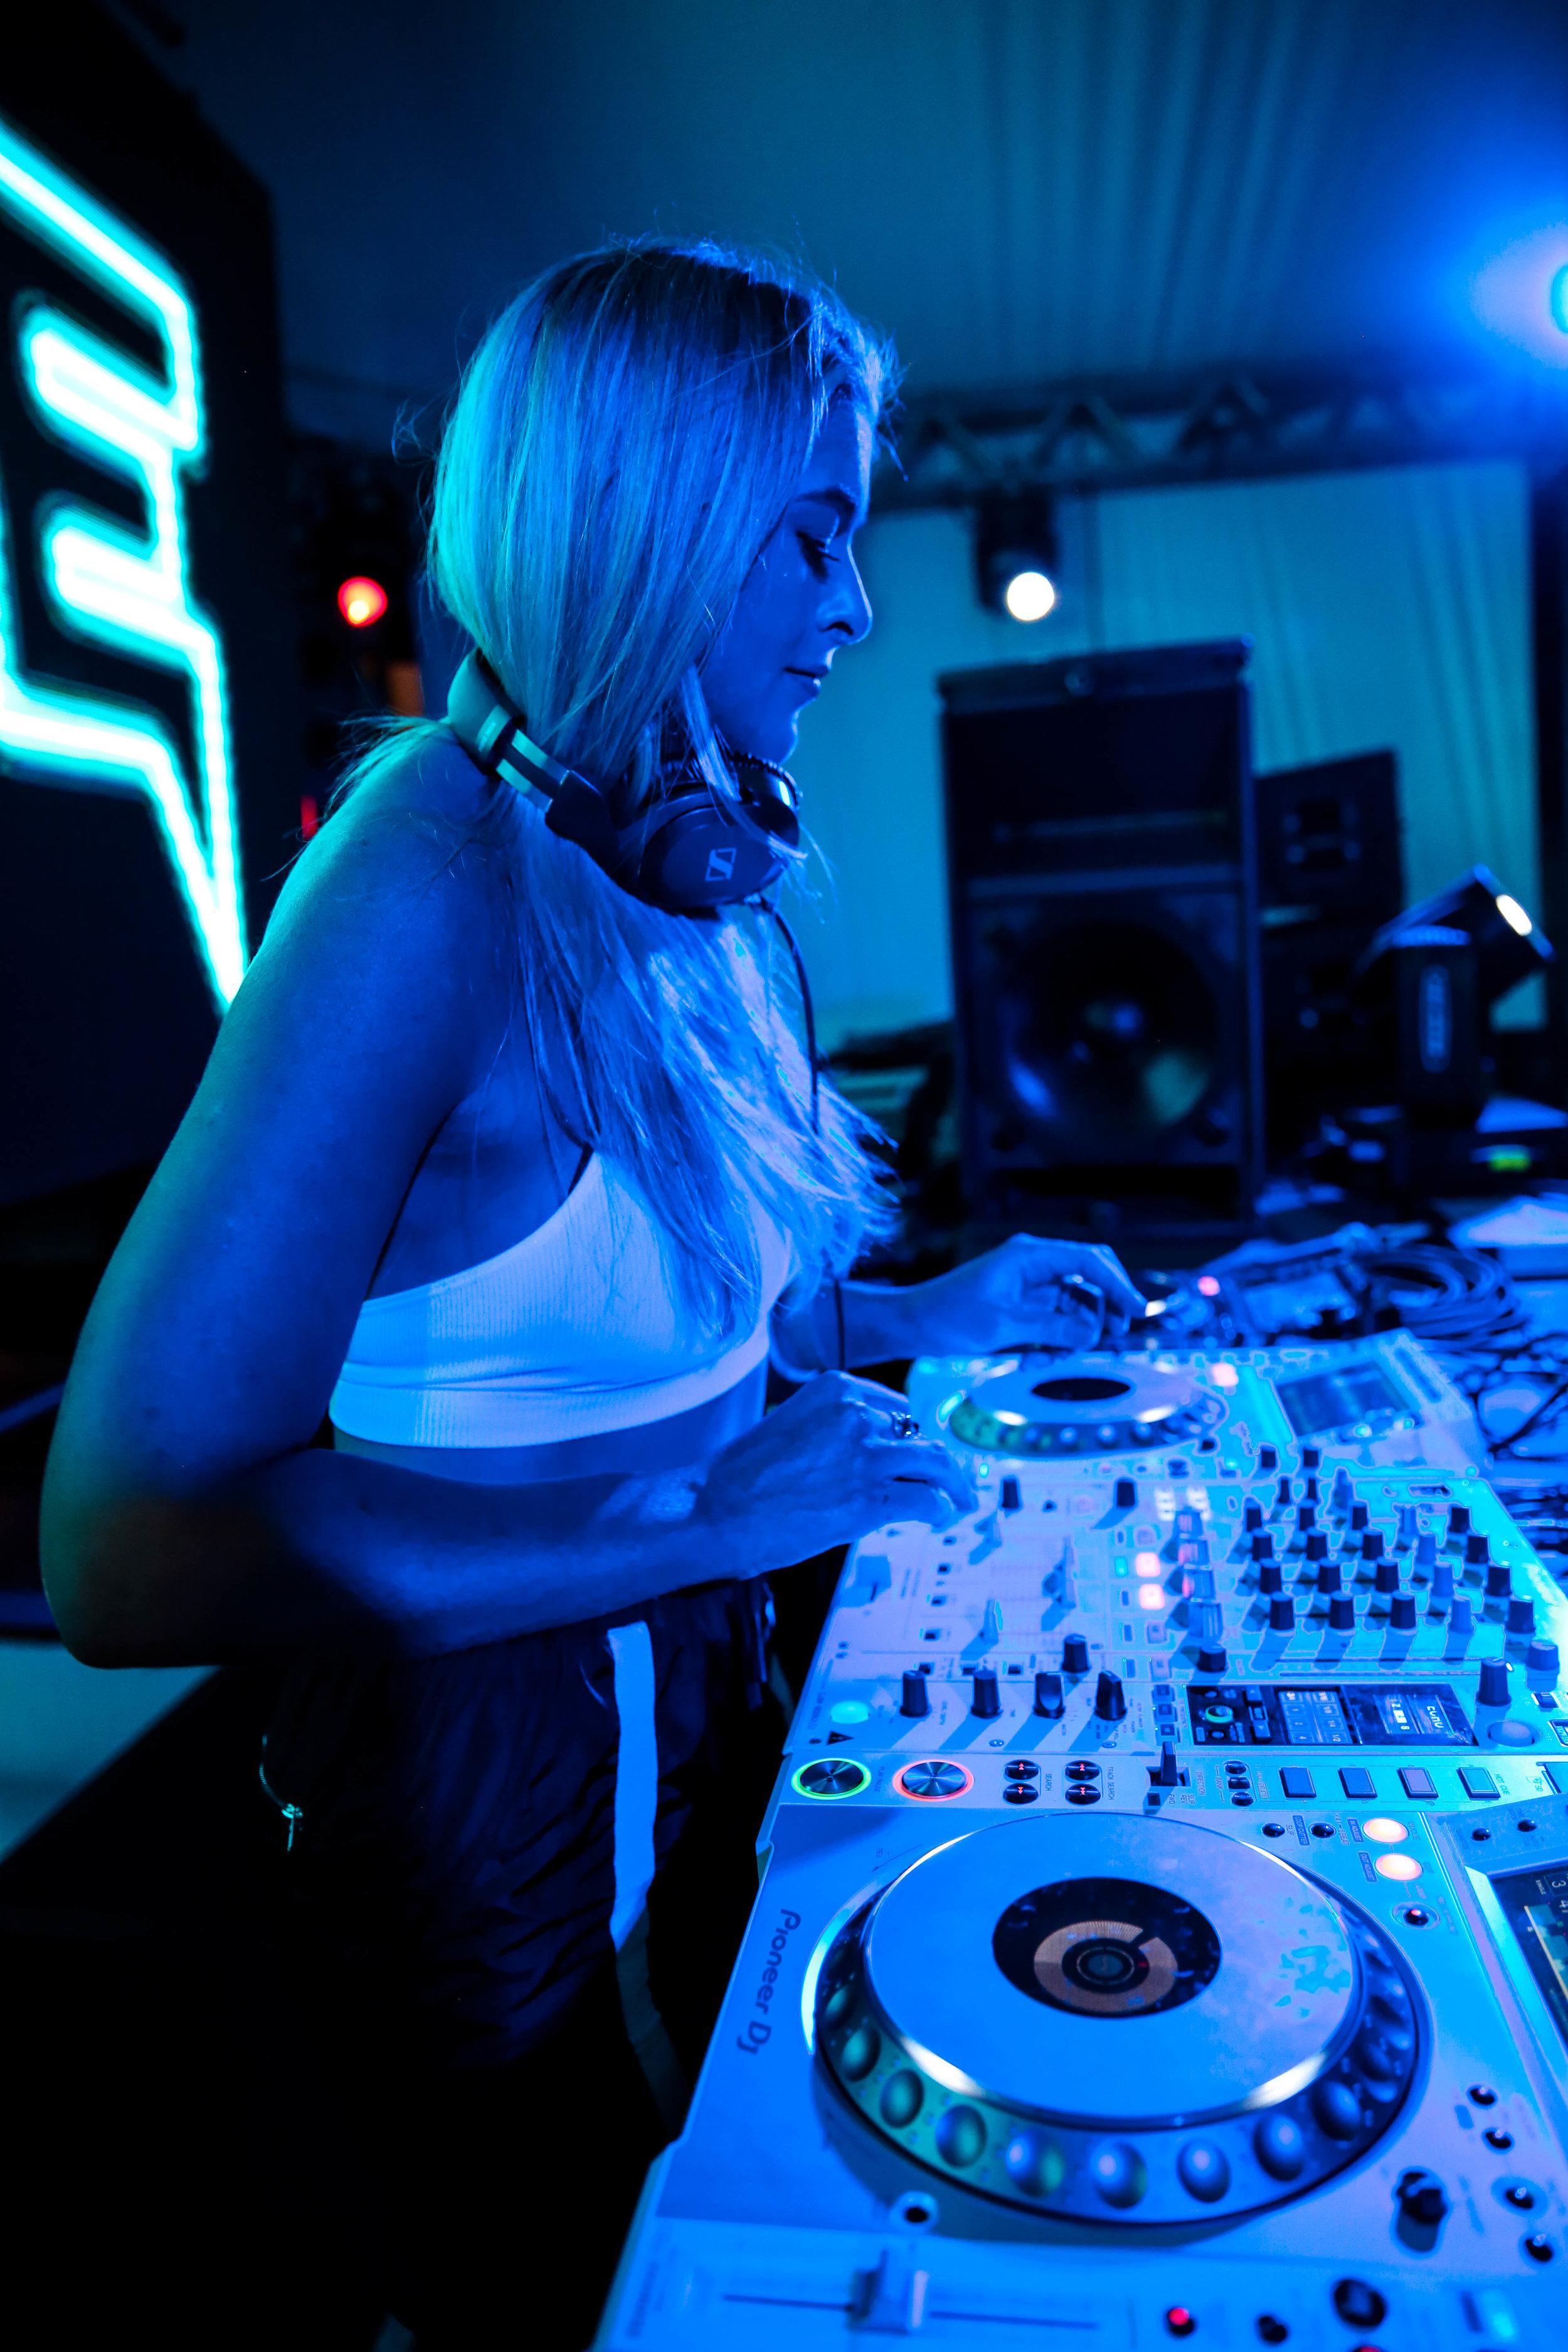 12 - TDade SLS Brickell Miami FL Tricia Dade DJ T.Dade-0686 copy 2.jpg